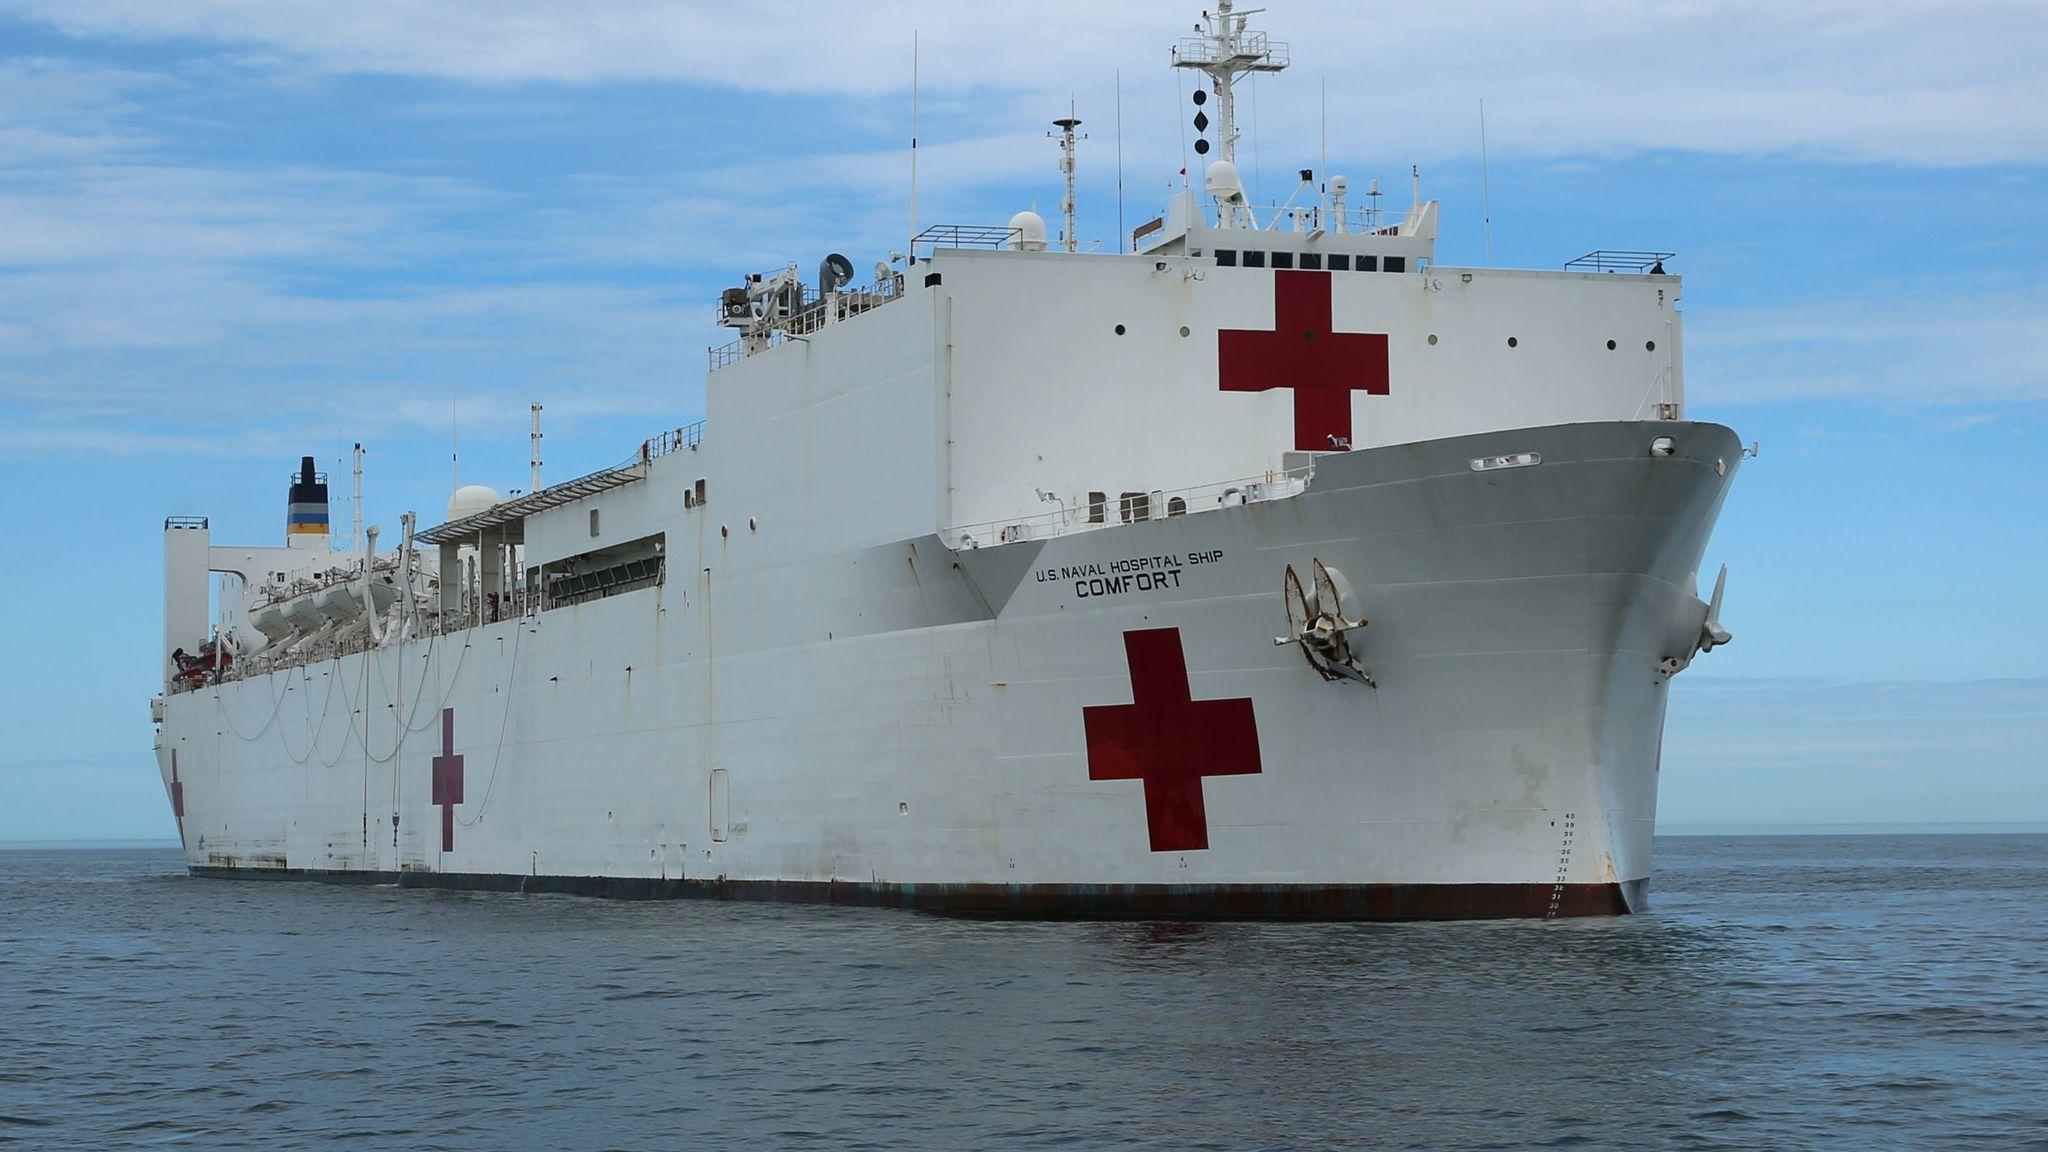 Hospital ship comfort heads to puerto rico daily press stopboris Choice Image